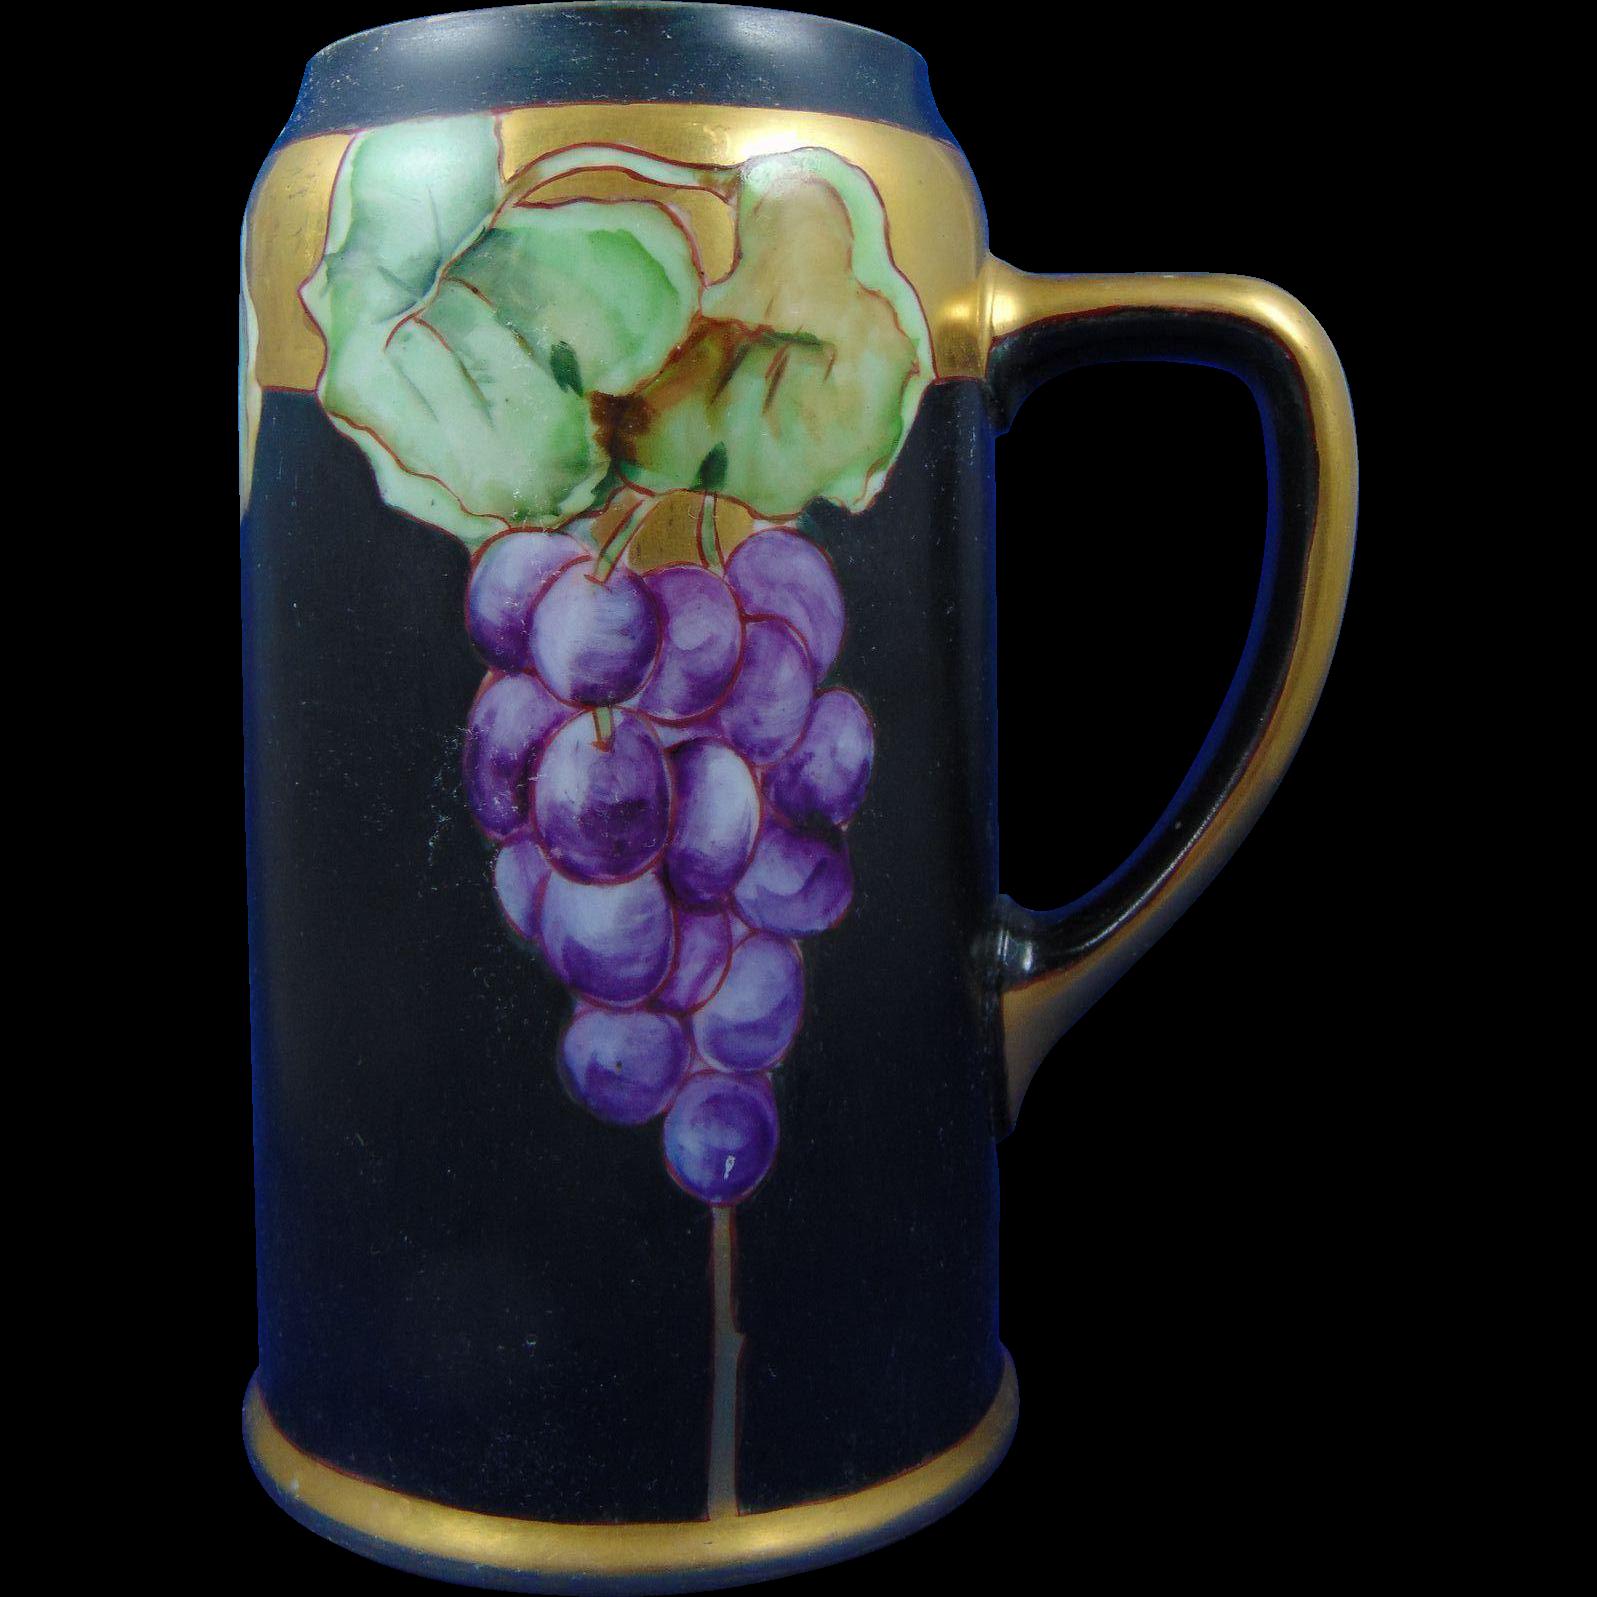 Moritz Zdekauer (MZ) Austria Grape Motif Stein/Mug (c.1884-1909)